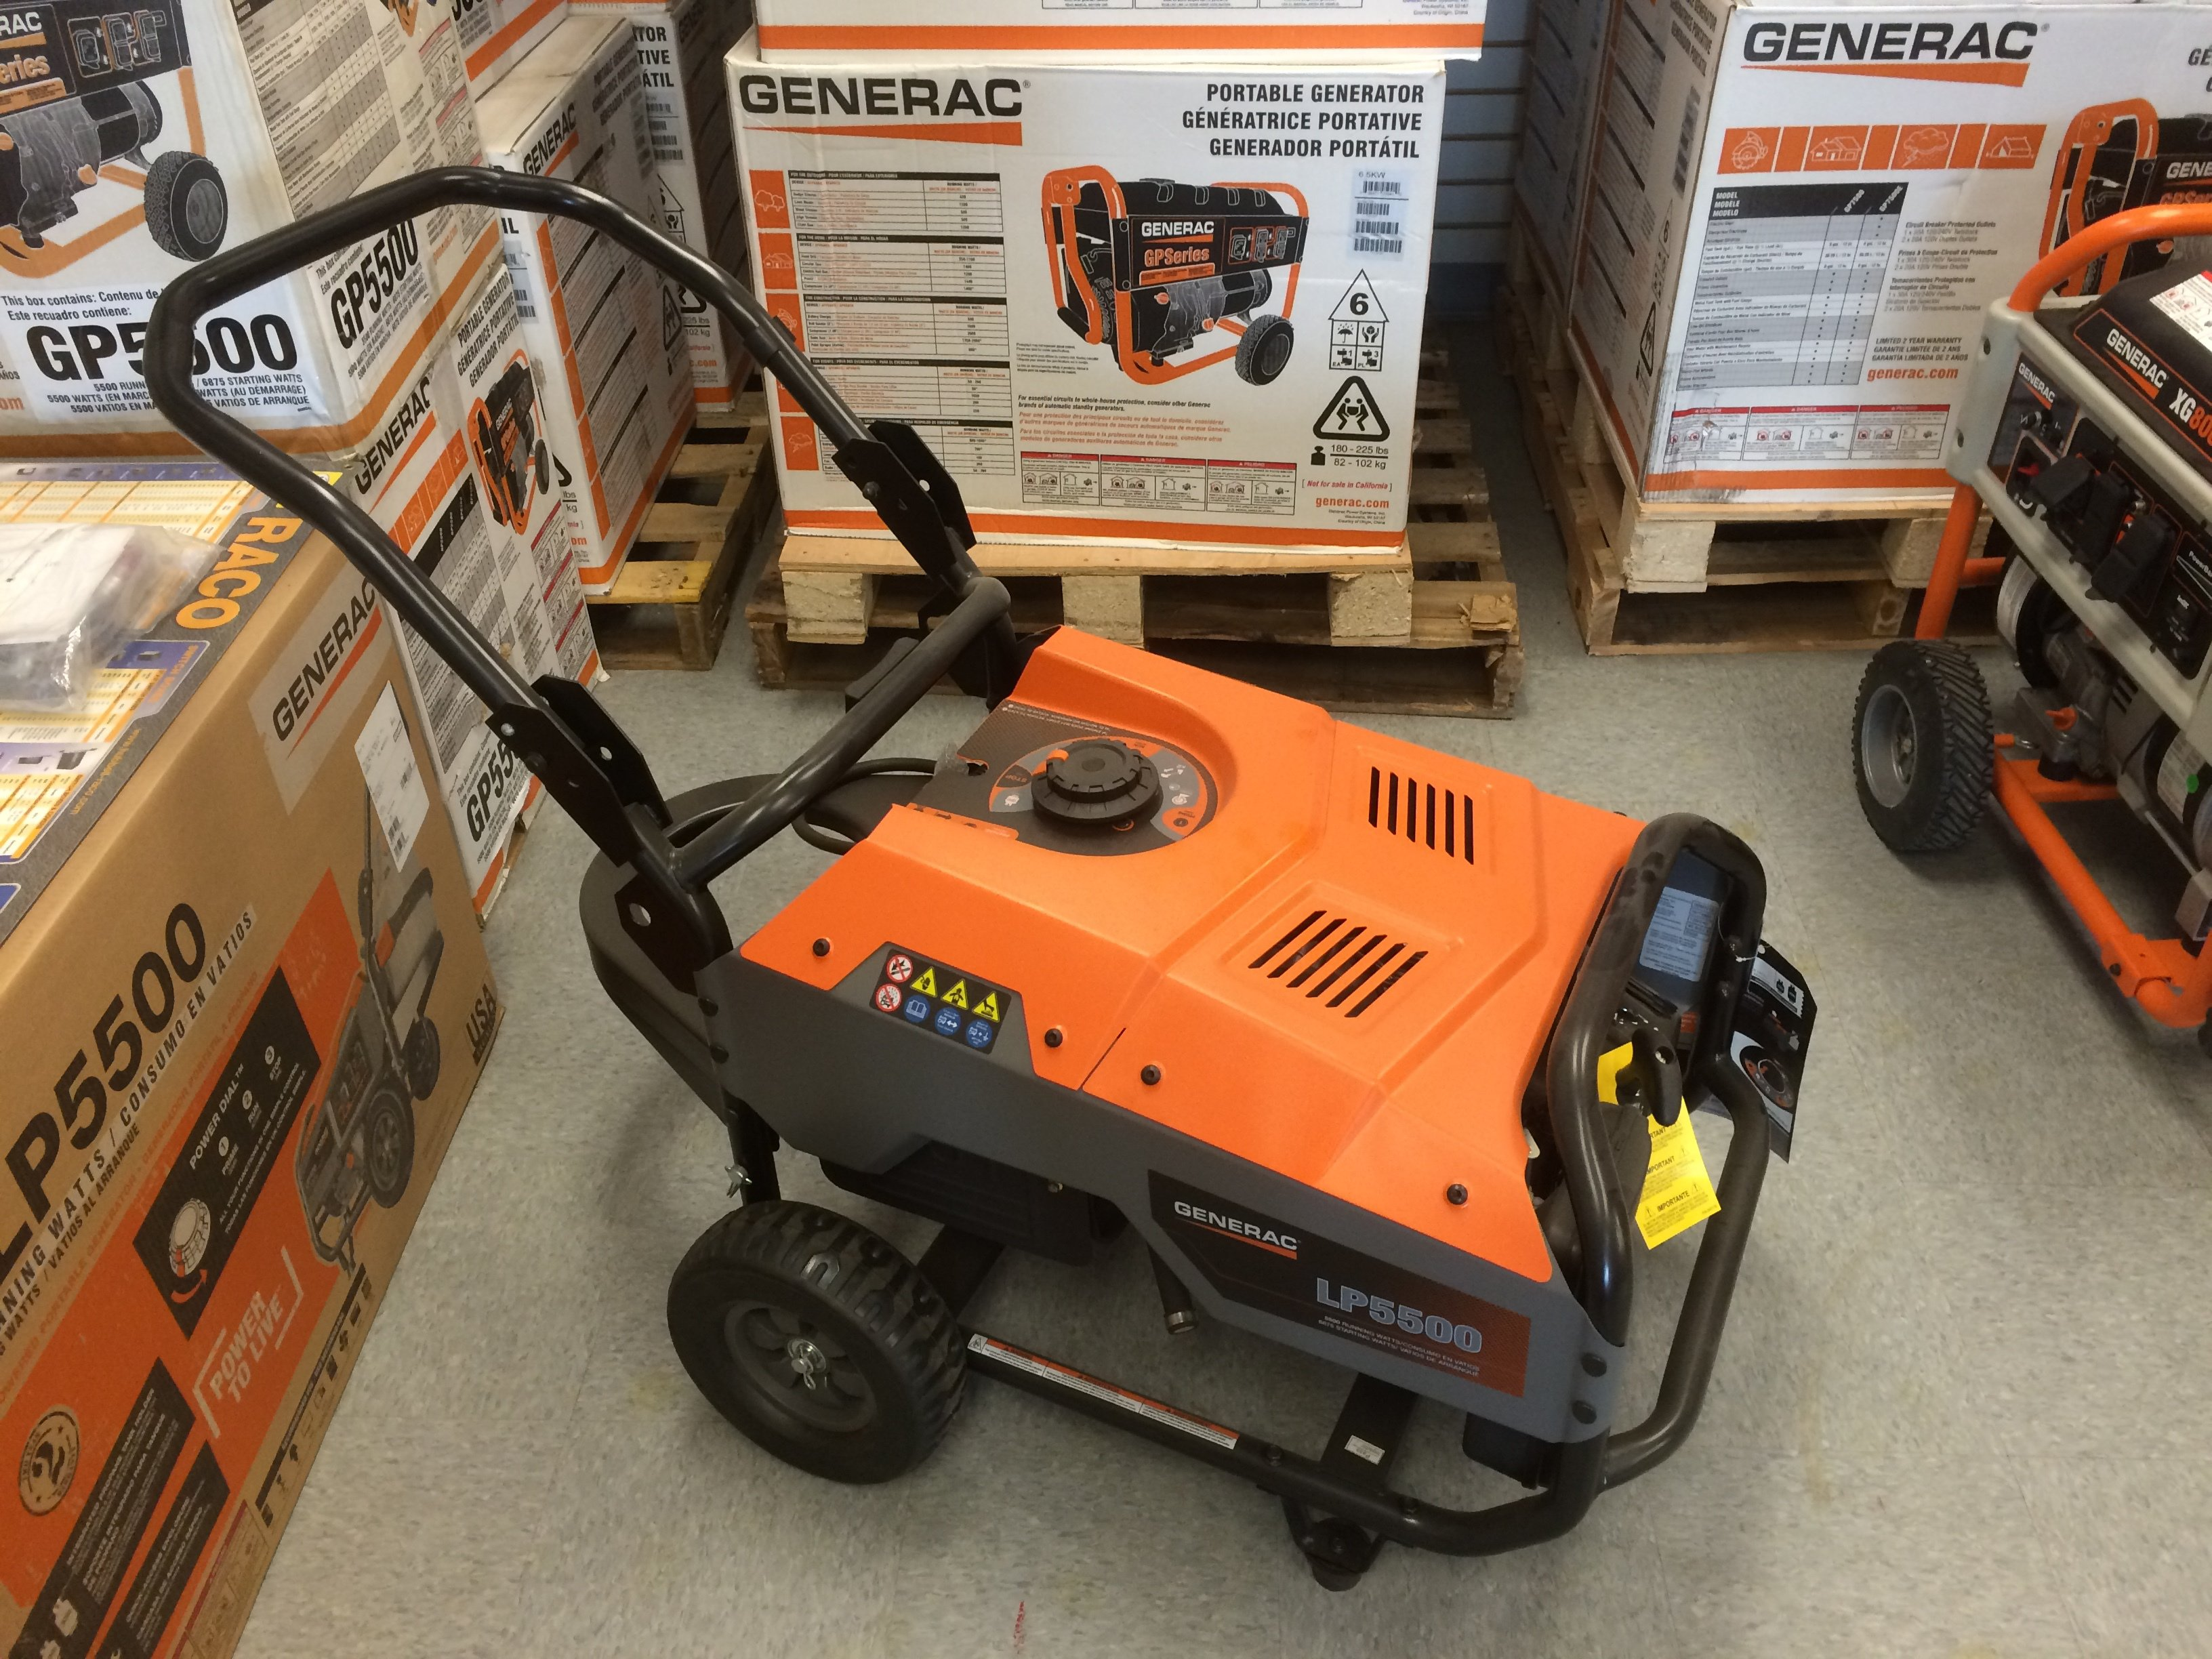 Electrical Supply & Portable Generators Newtown & Danbury CT